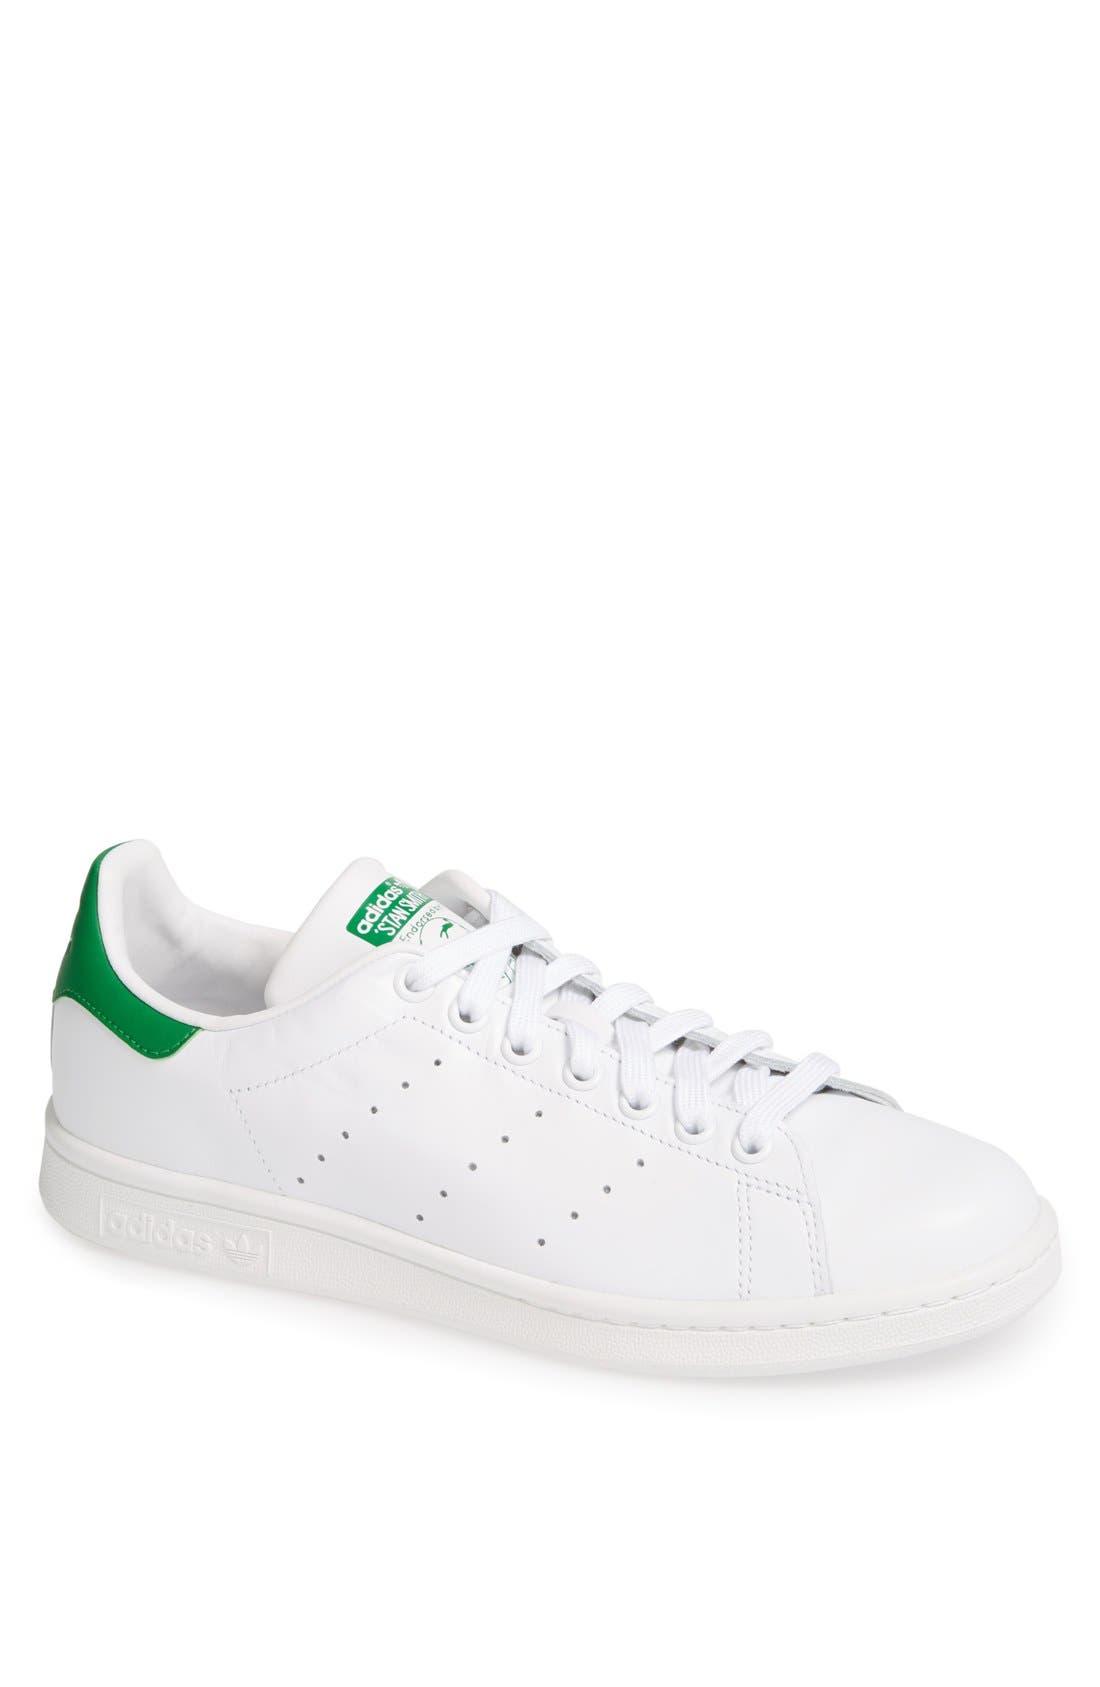 ADIDAS Stan Smith Sneaker, Main, color, WHITE/ FAIRWAY